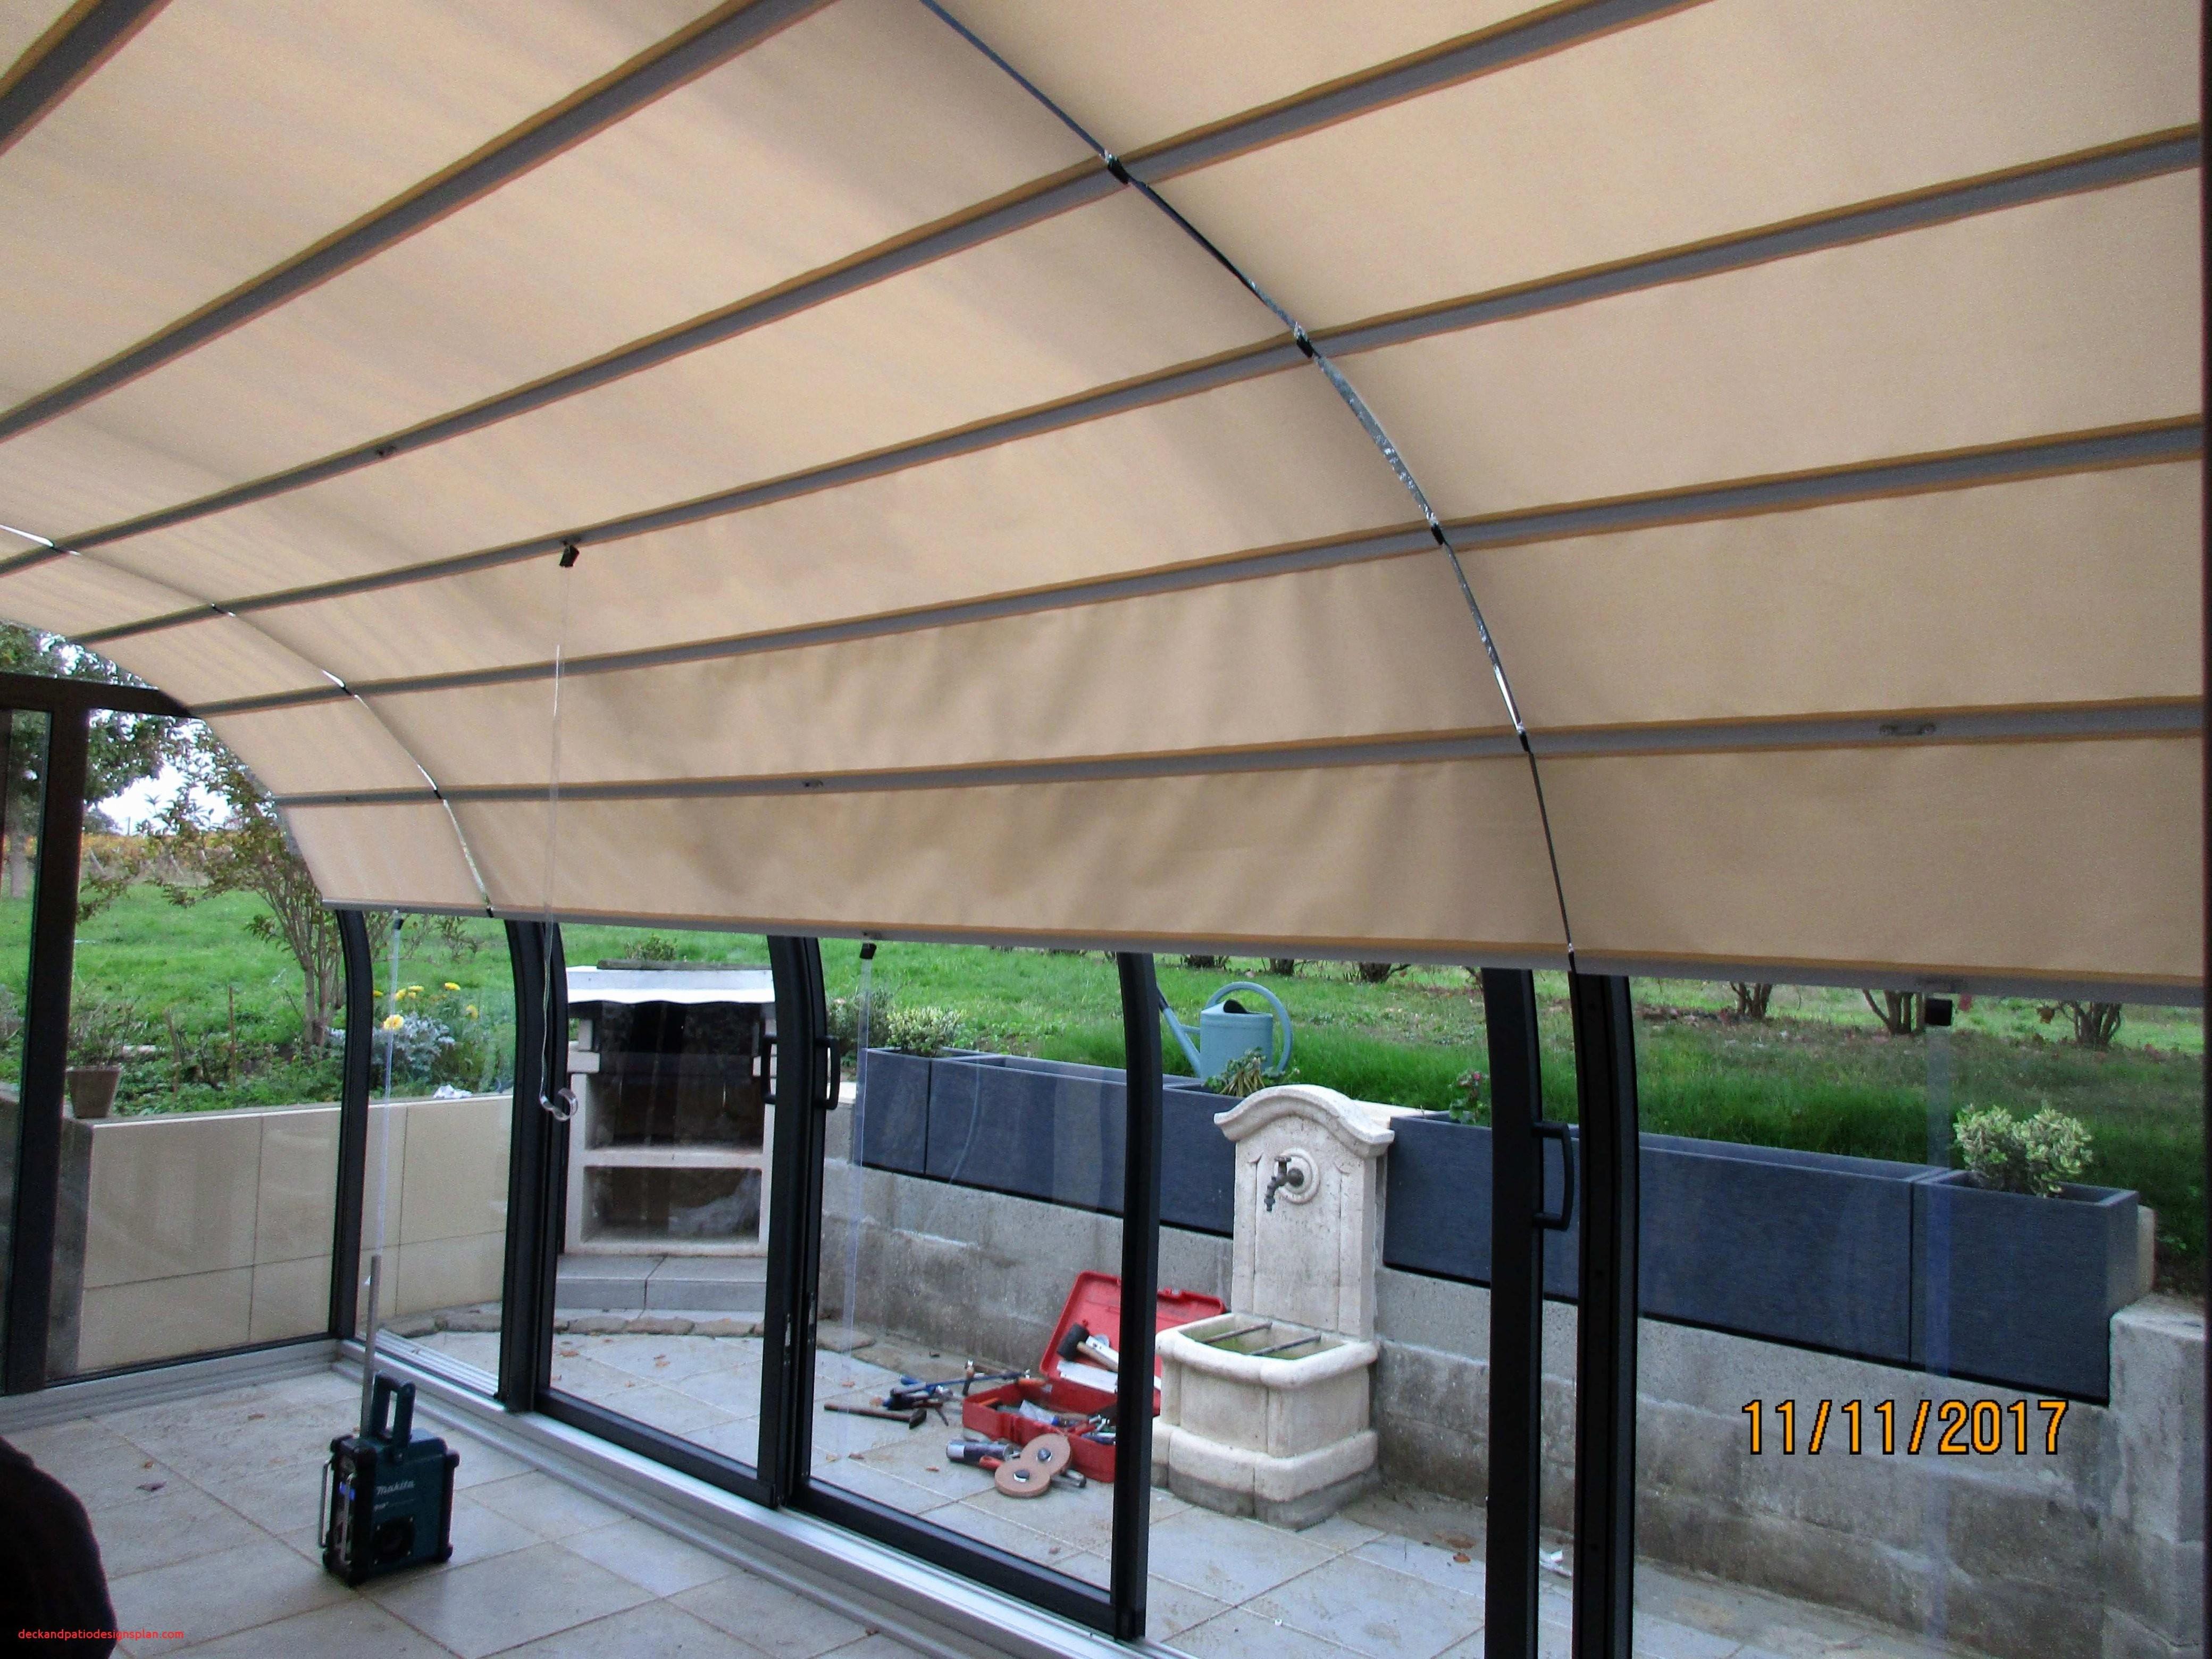 Windschutz Acrylglas Terrasse Frisch Windfang Selber Bauen von Windschutz Terrasse Selber Bauen Photo